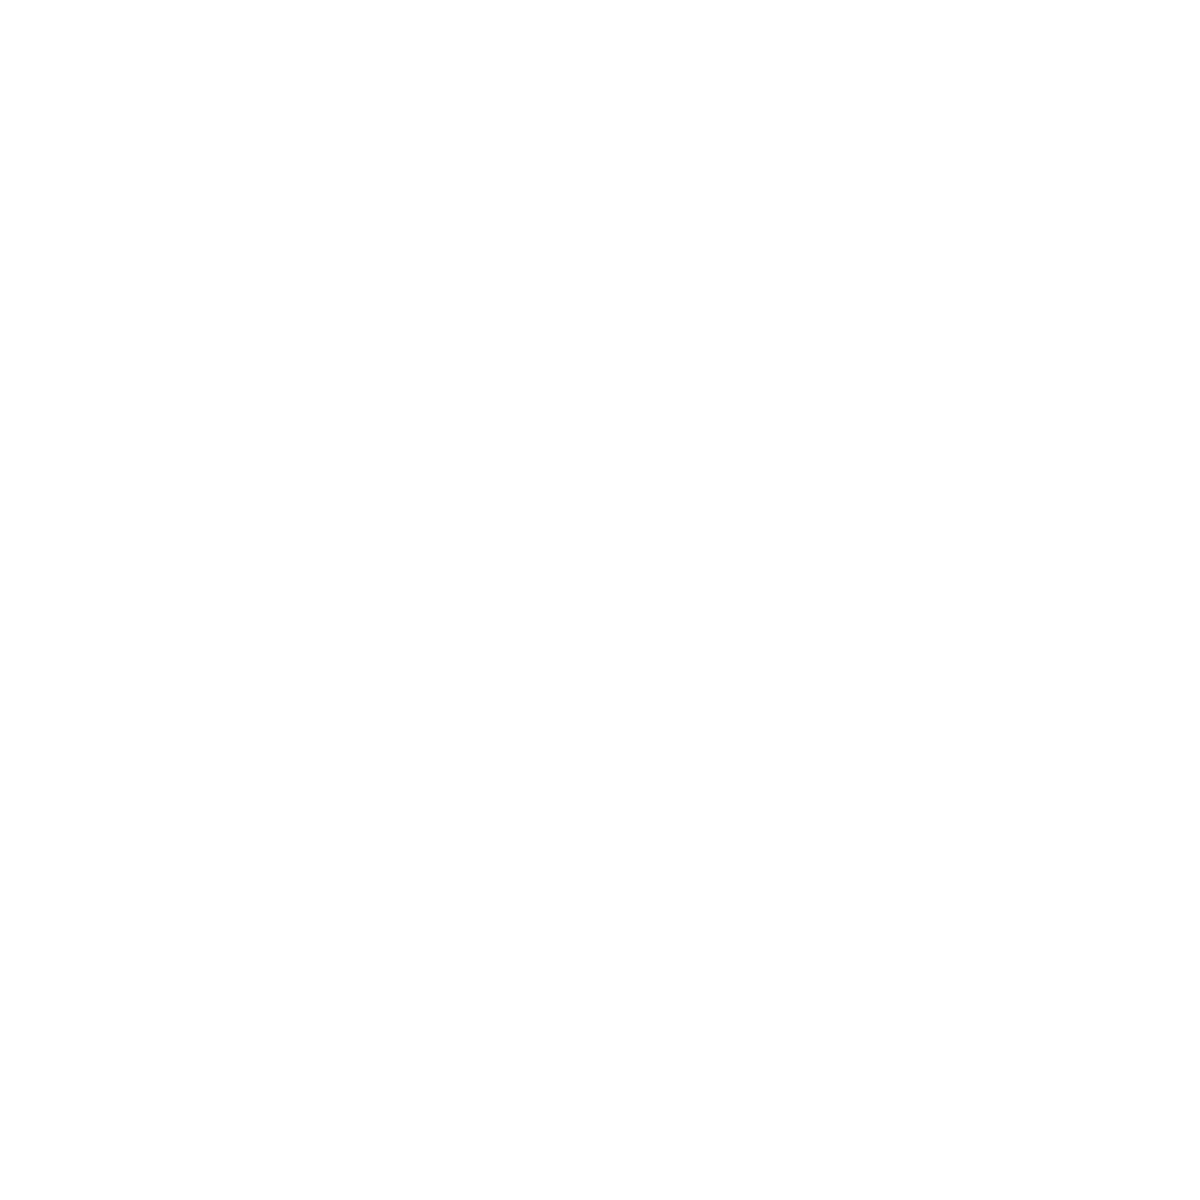 Zapier Logomark White